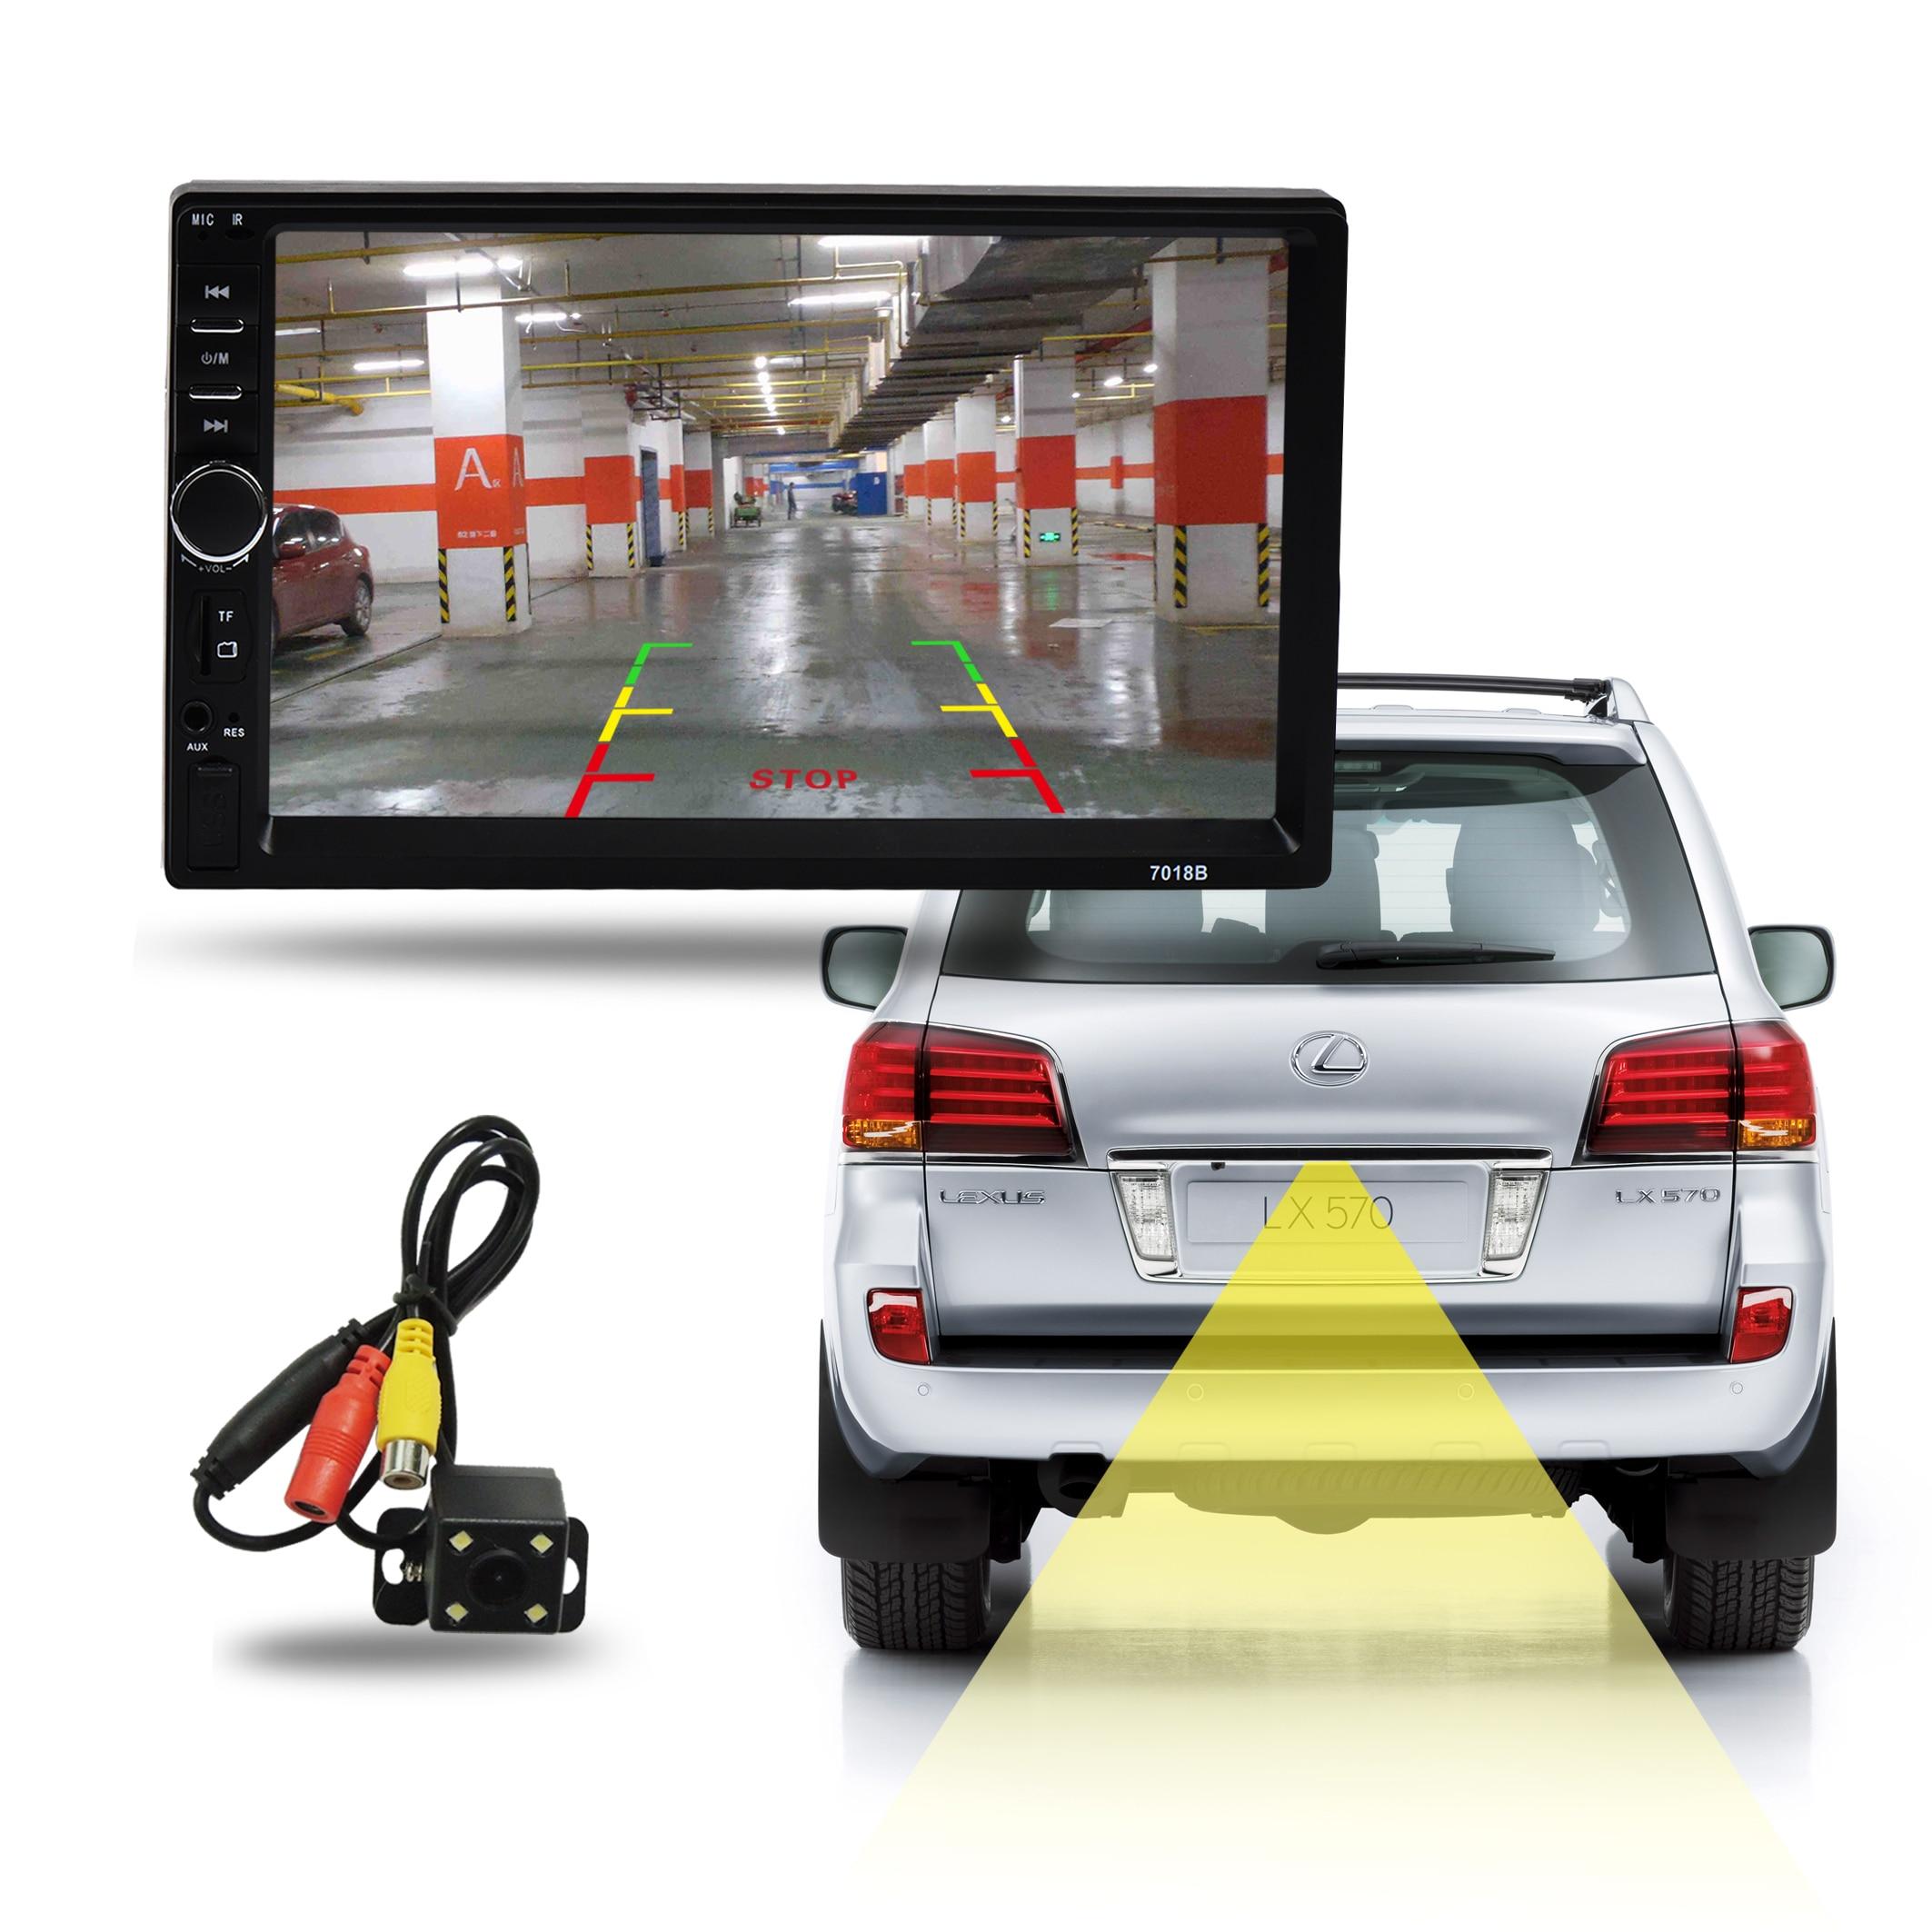 2Din سيارة MP5 لاعب 7018b راديو تلقائي 7 ''HD شاشة تعمل باللمس 1080P FM AM TF USB جفل Sys ستيريو رقمي 2 الدين MP5 Aotomotivo فيديو